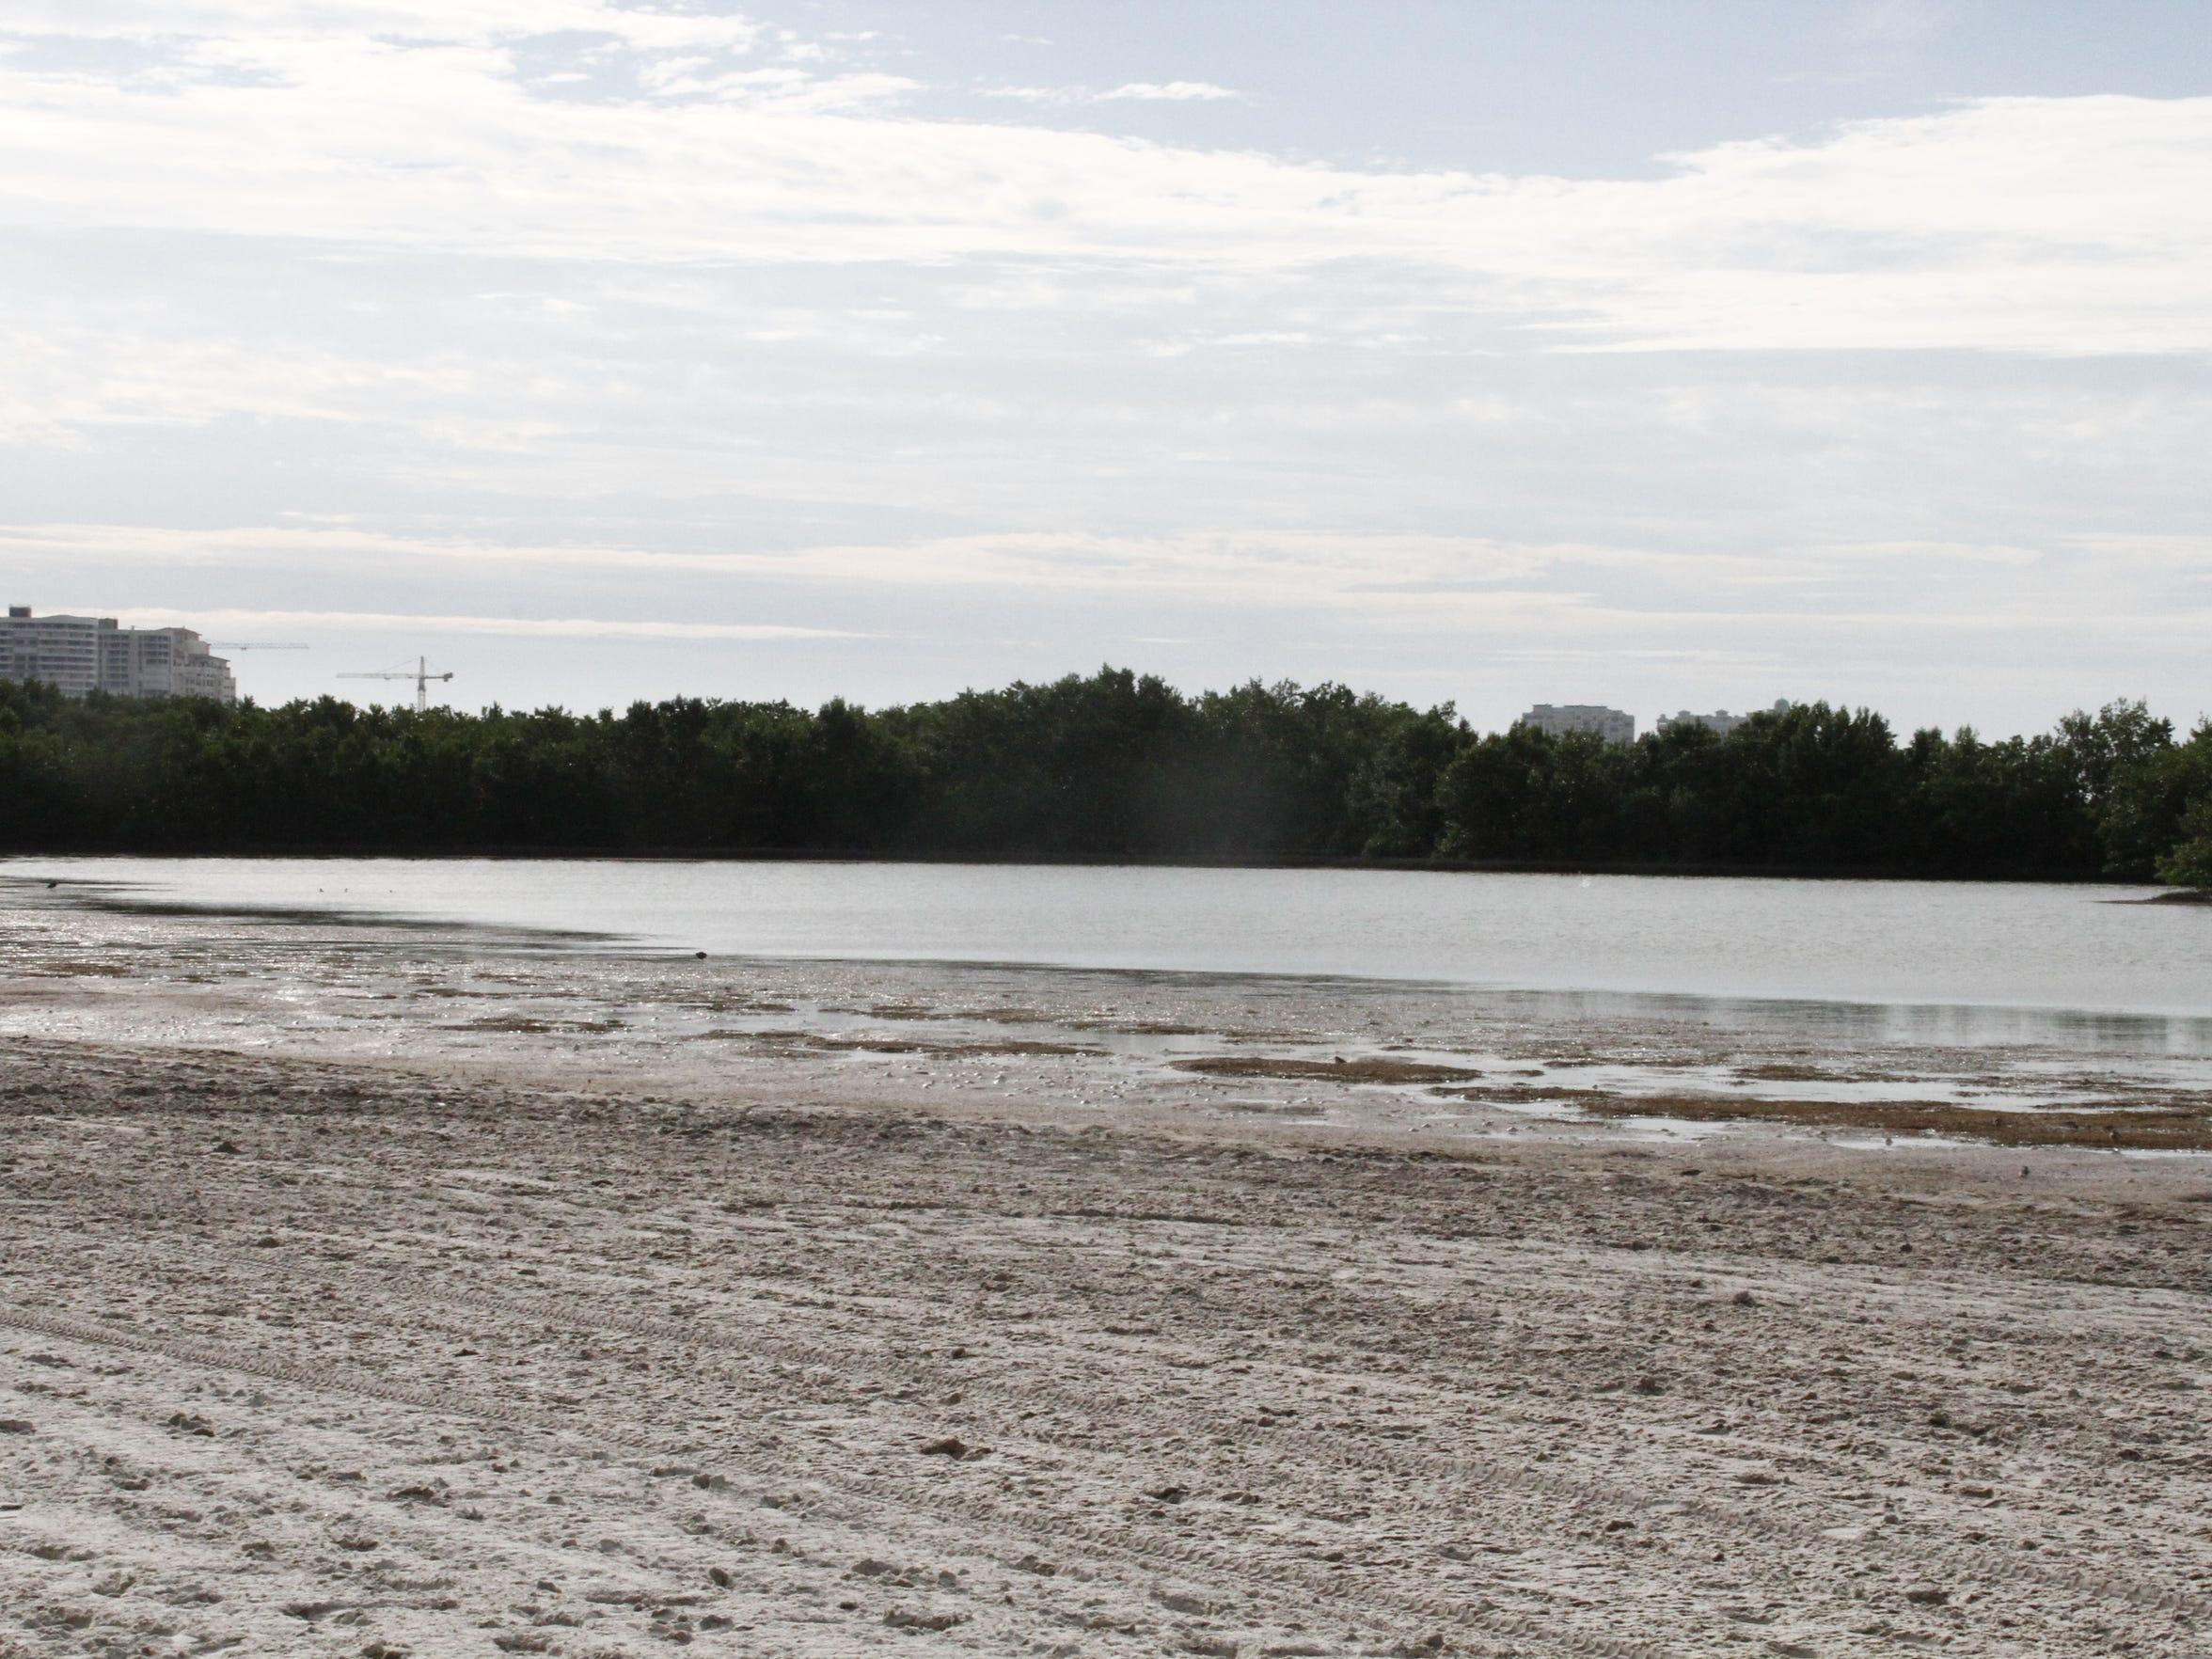 Friends of Tigertail Beach is a non-profit organization